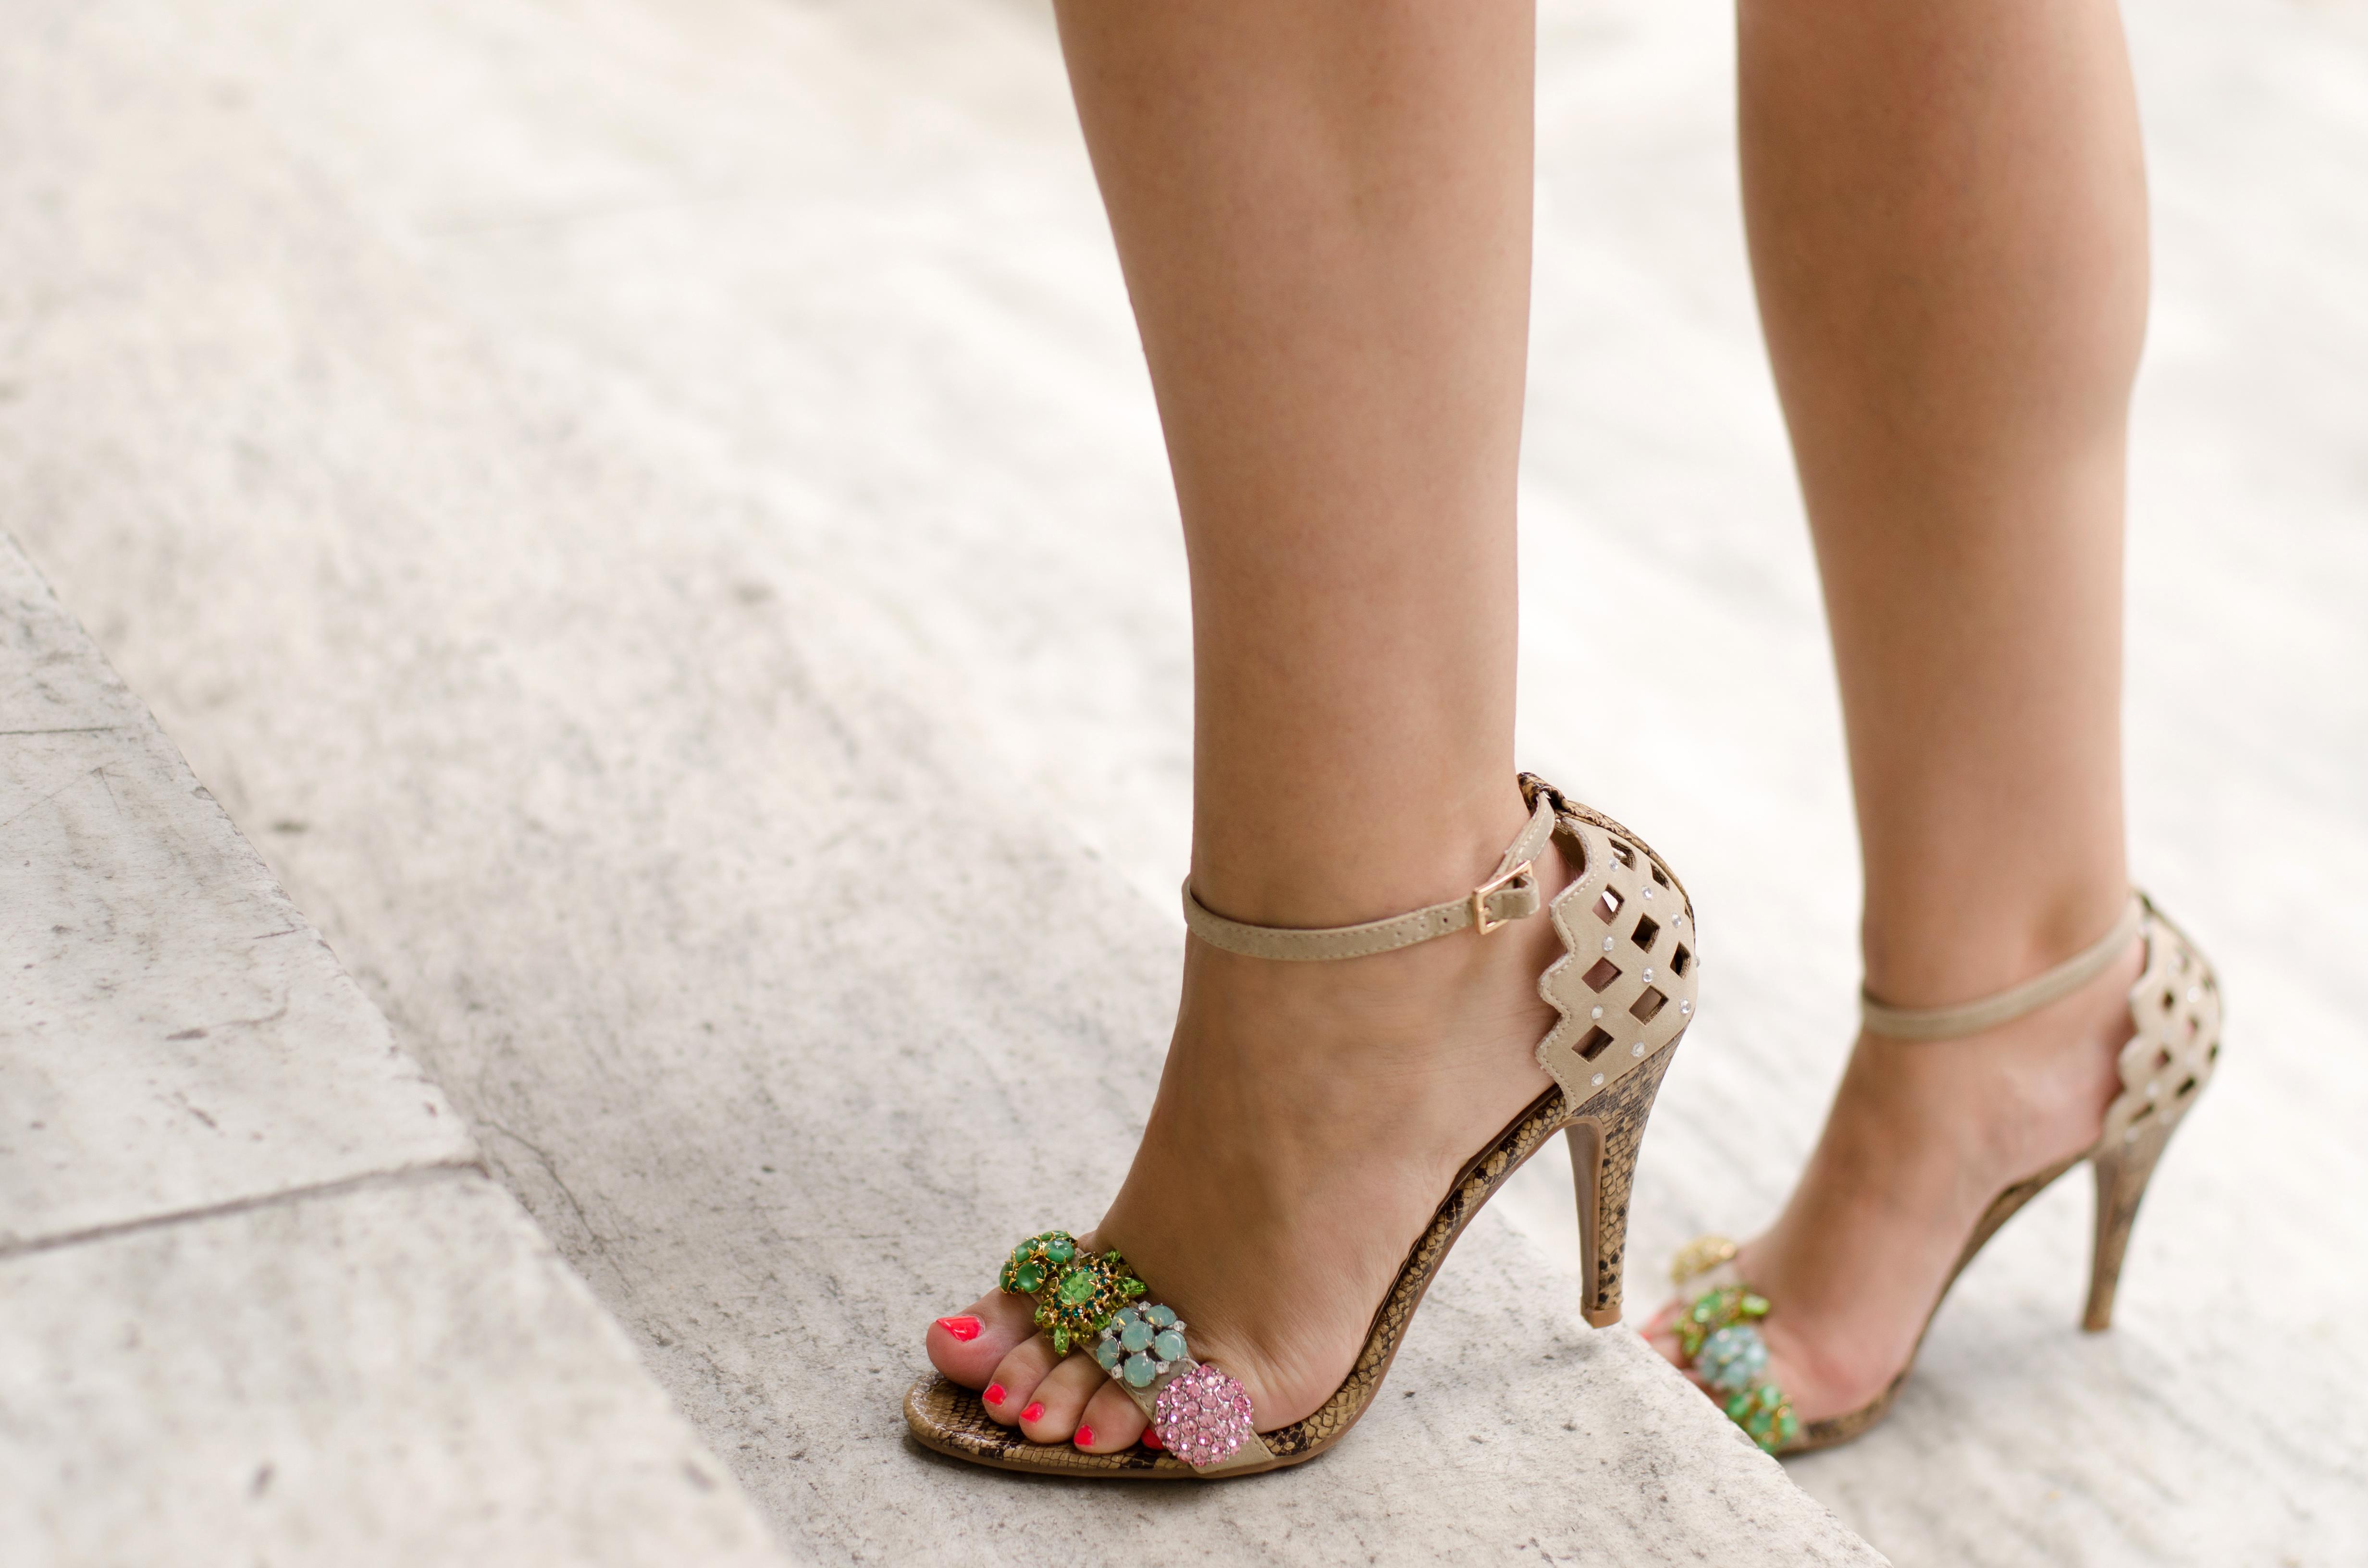 76bea04f9451 heels shoes – courtesy of mjtrim-com – THE ISLAND JOURNAL